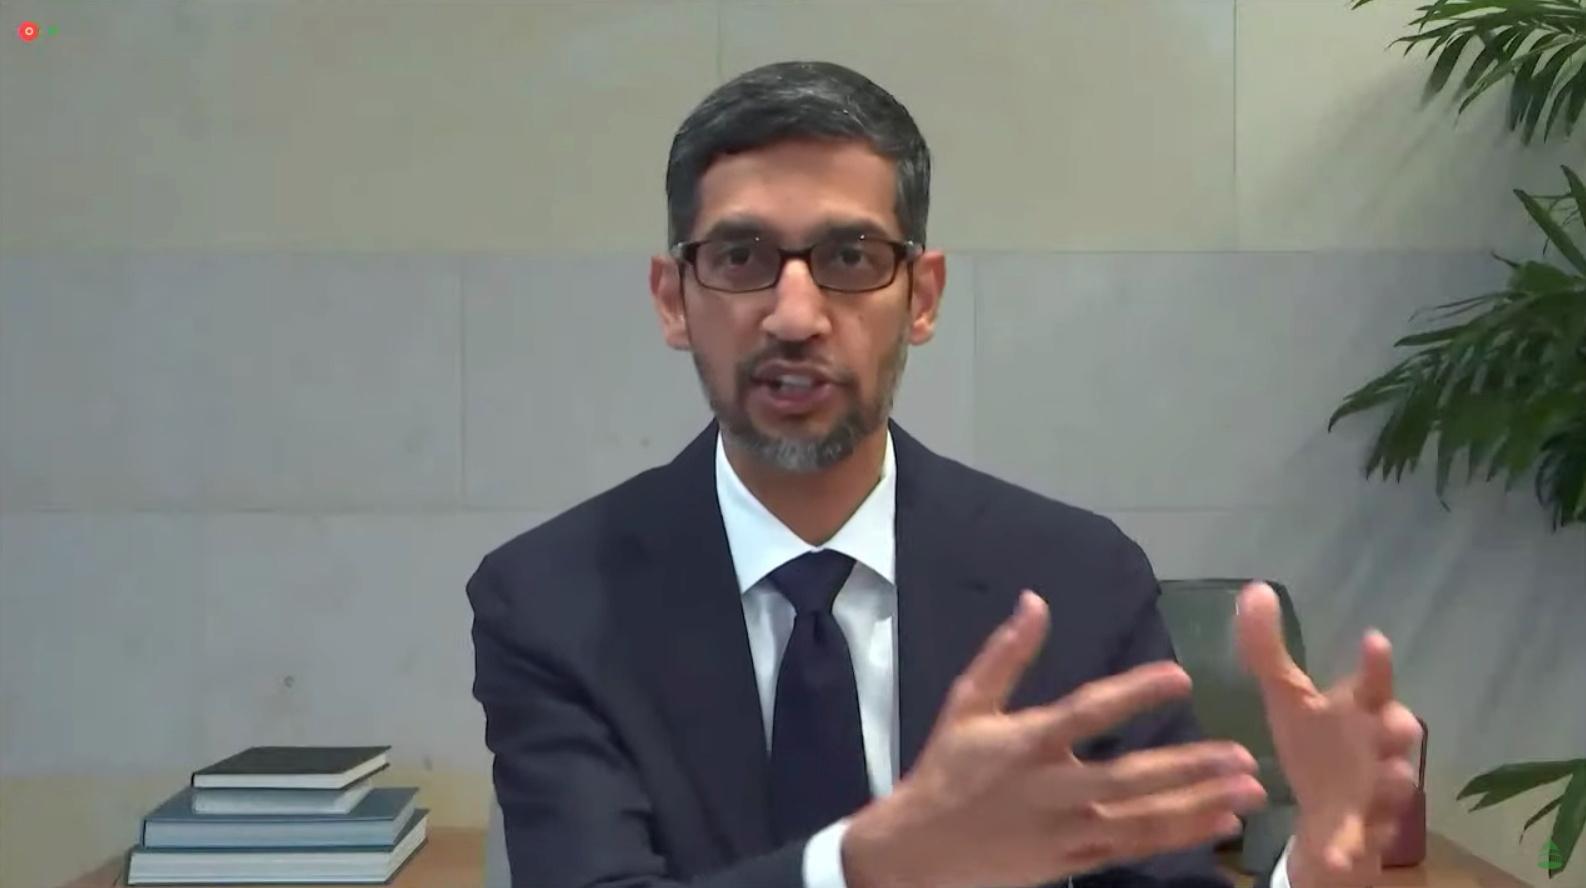 Google CEO Sundar Pichai.  U.S. House of Representatives Energy and Commerce Committee/Handout via Reuters